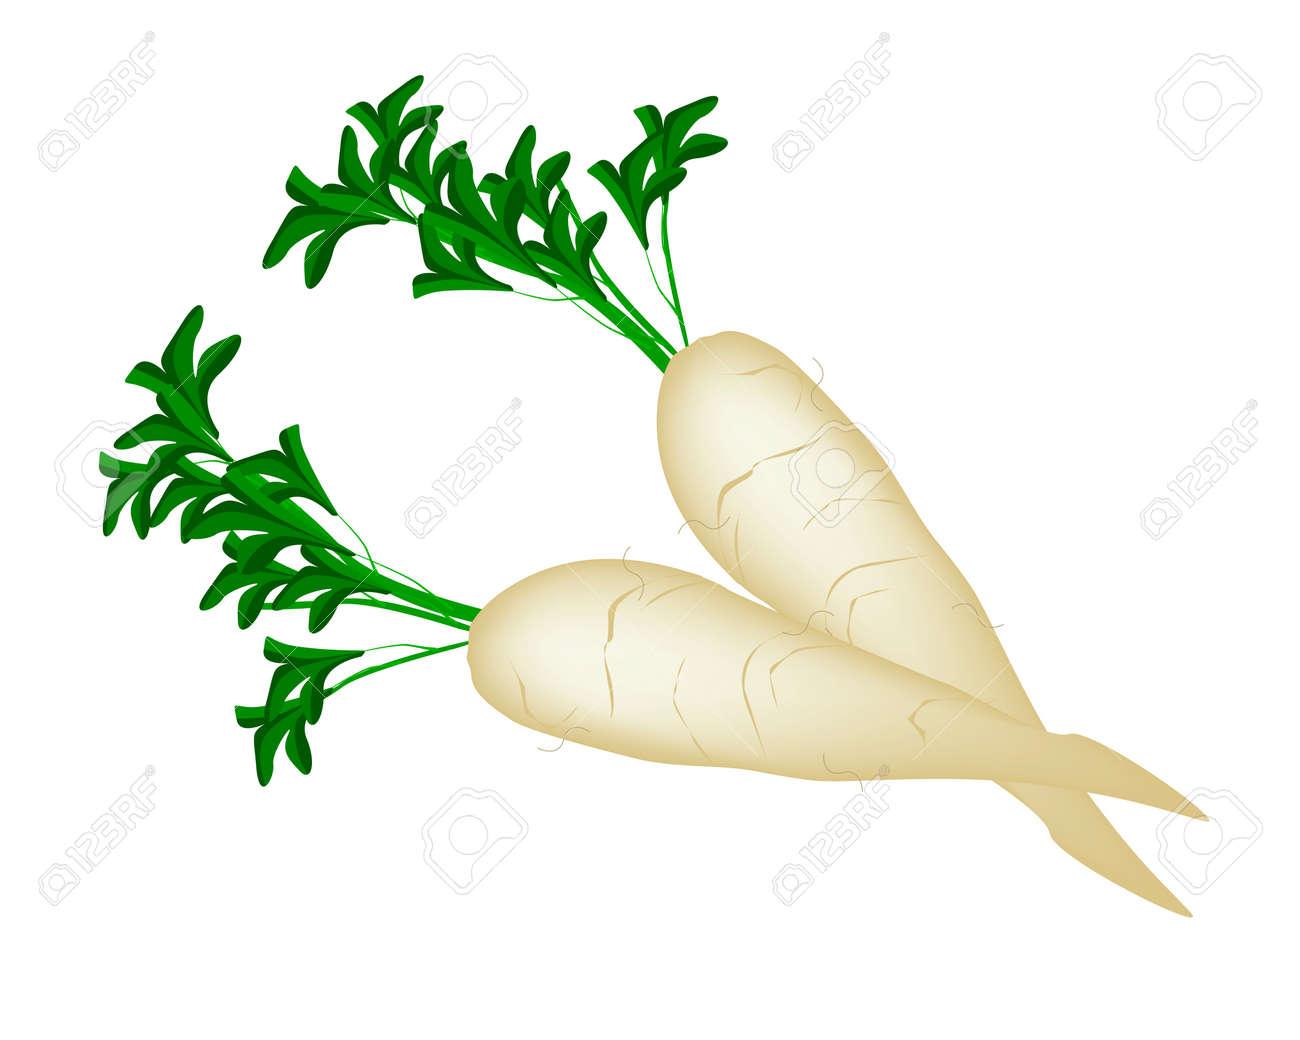 vegetable vector illustration of fresh white radishes or daikon rh 123rf com radish clipart black and white radish image clipart